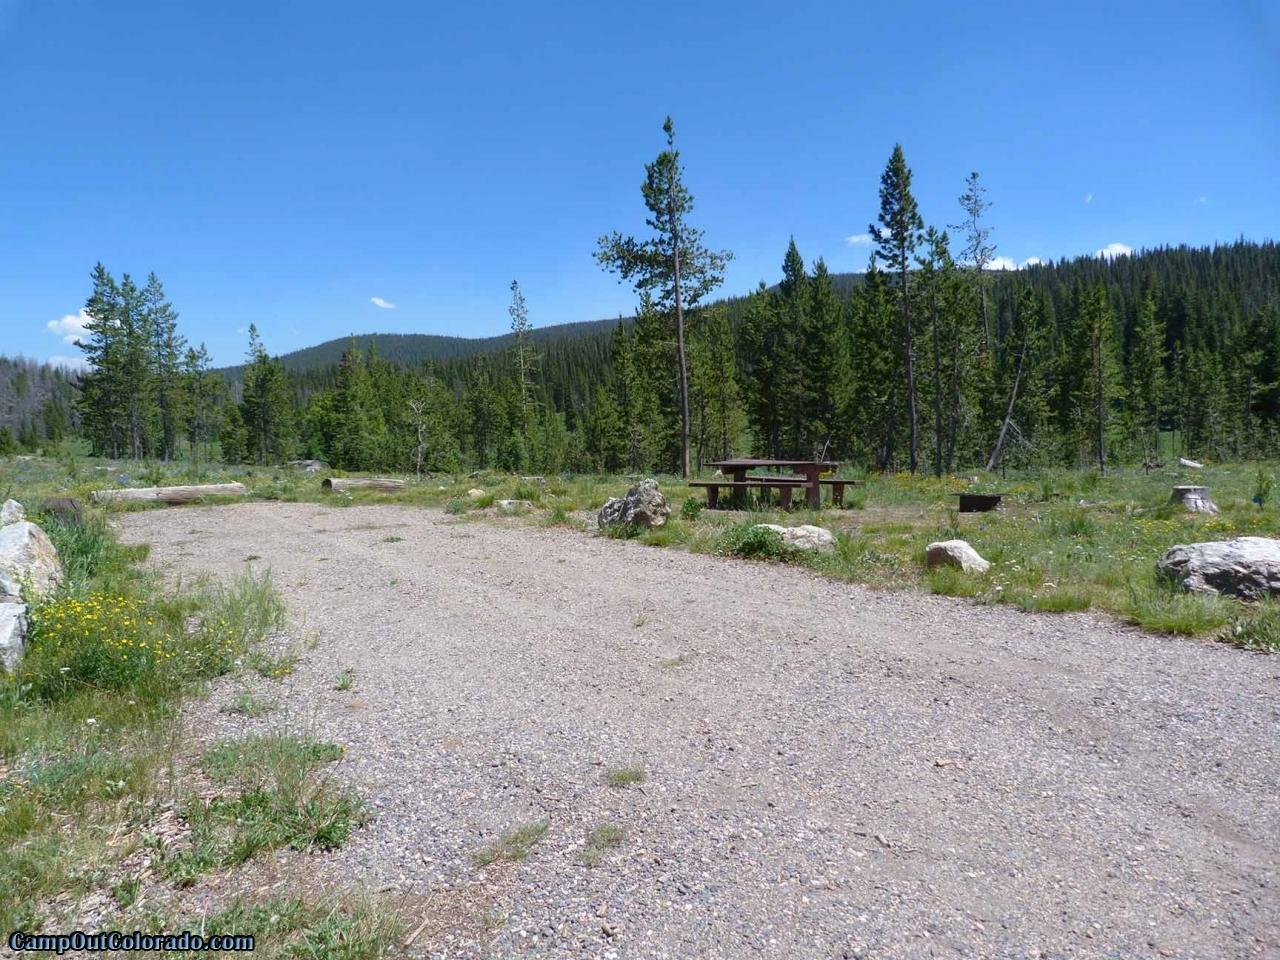 campoutcolorado-meadows-campground-rabbit-ears-rv-campsite